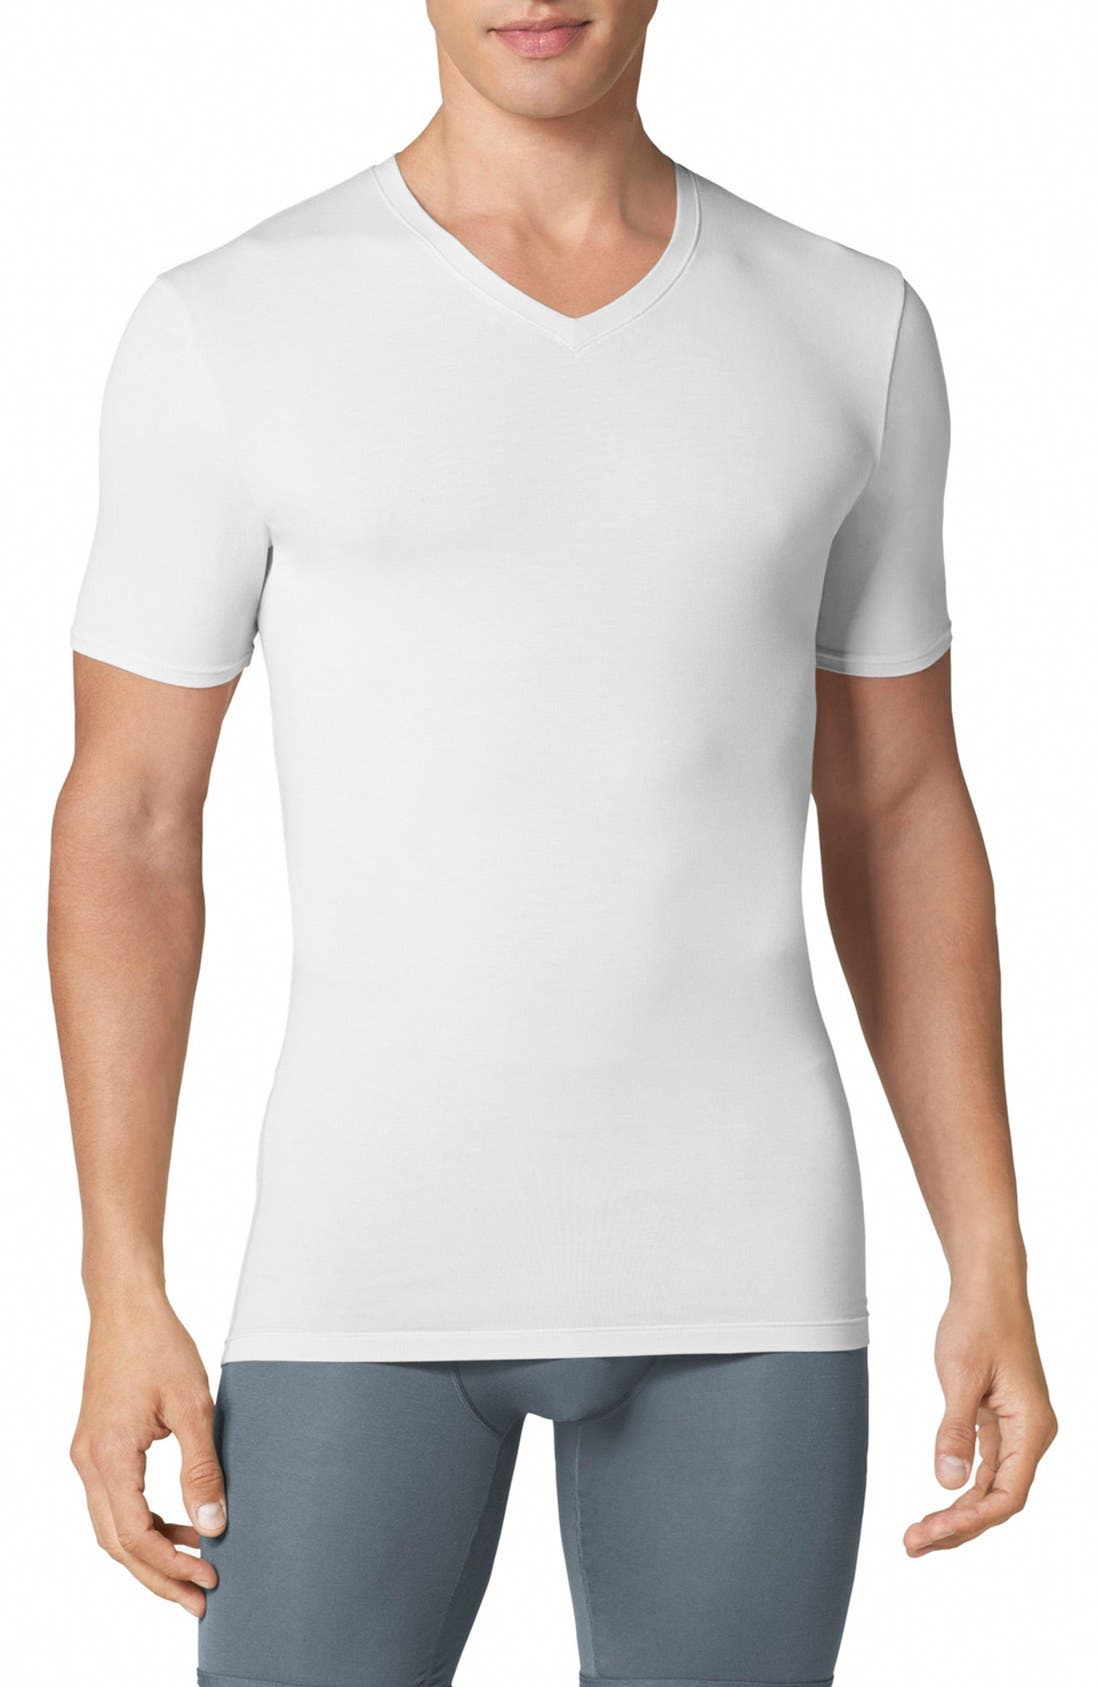 Alternate Image 1 Selected - Tommy John 'Second Skin' High V-Neck Undershirt